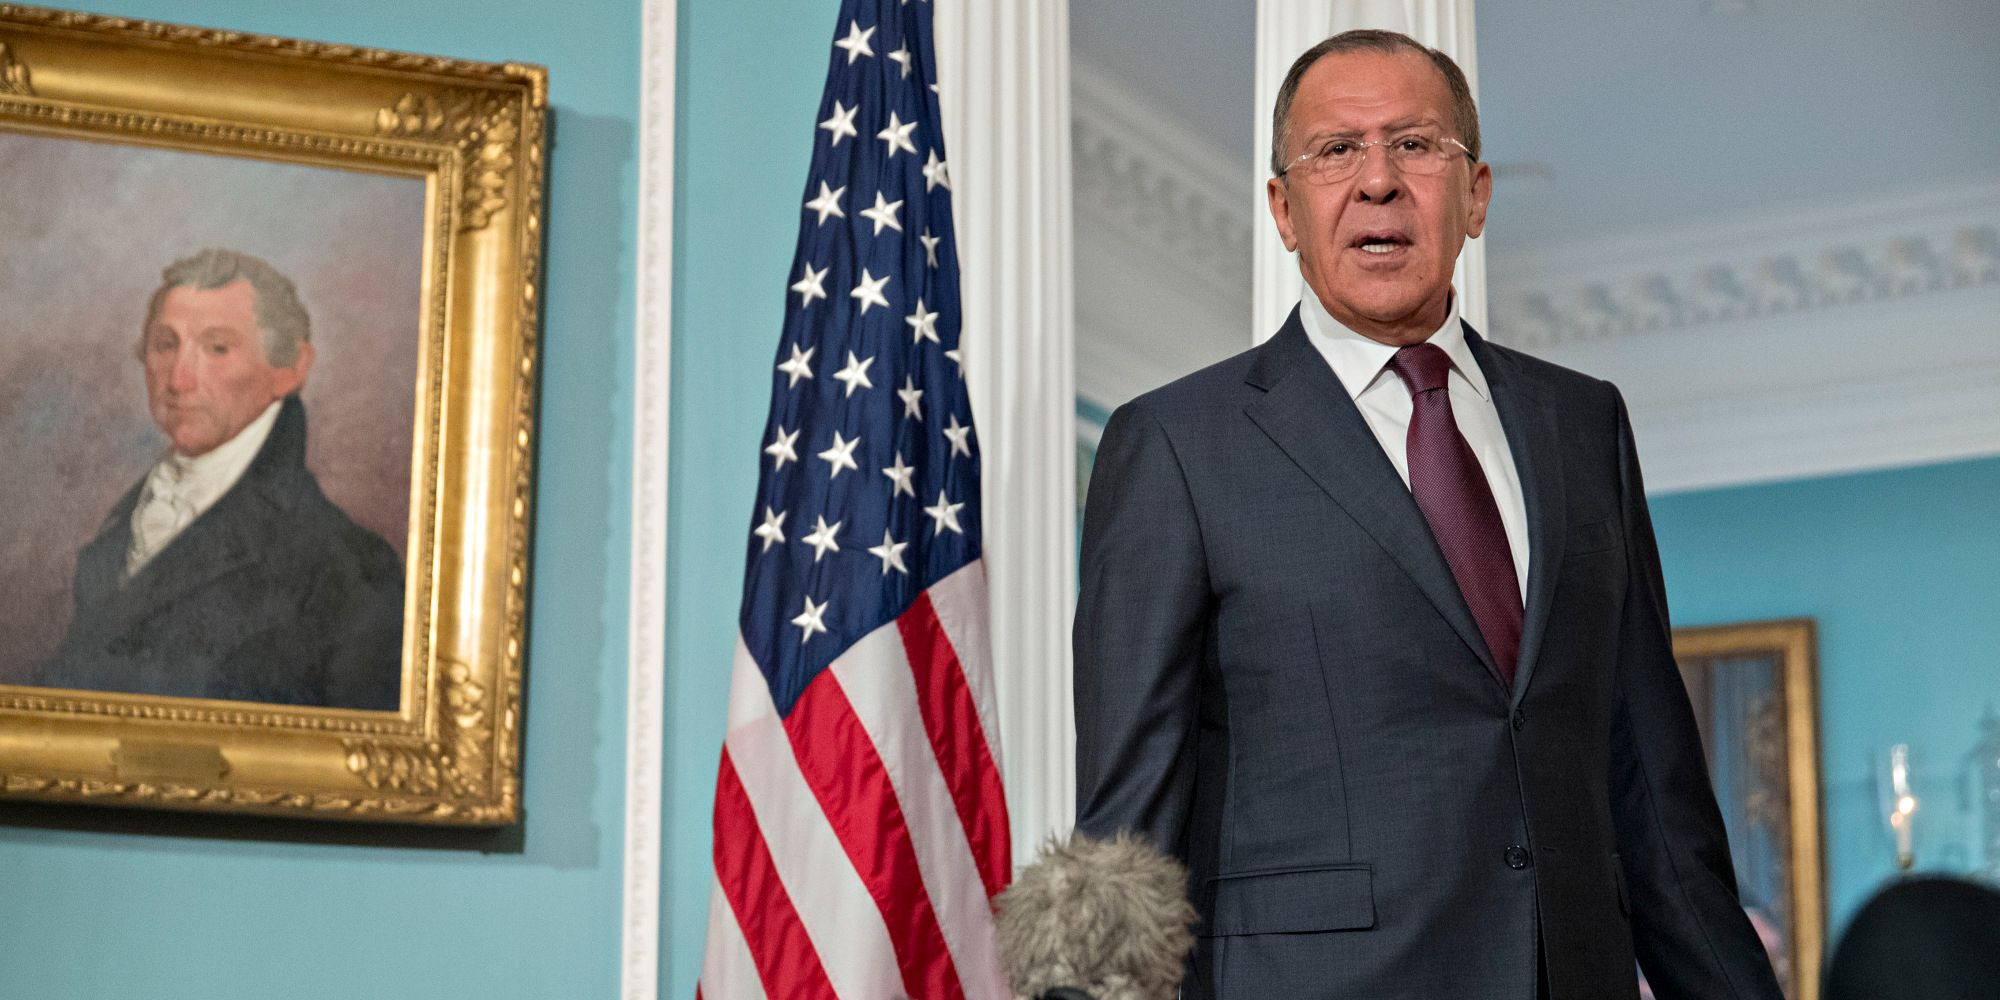 Trump to Meet Russian Envoy Lavrov During Washington Visit